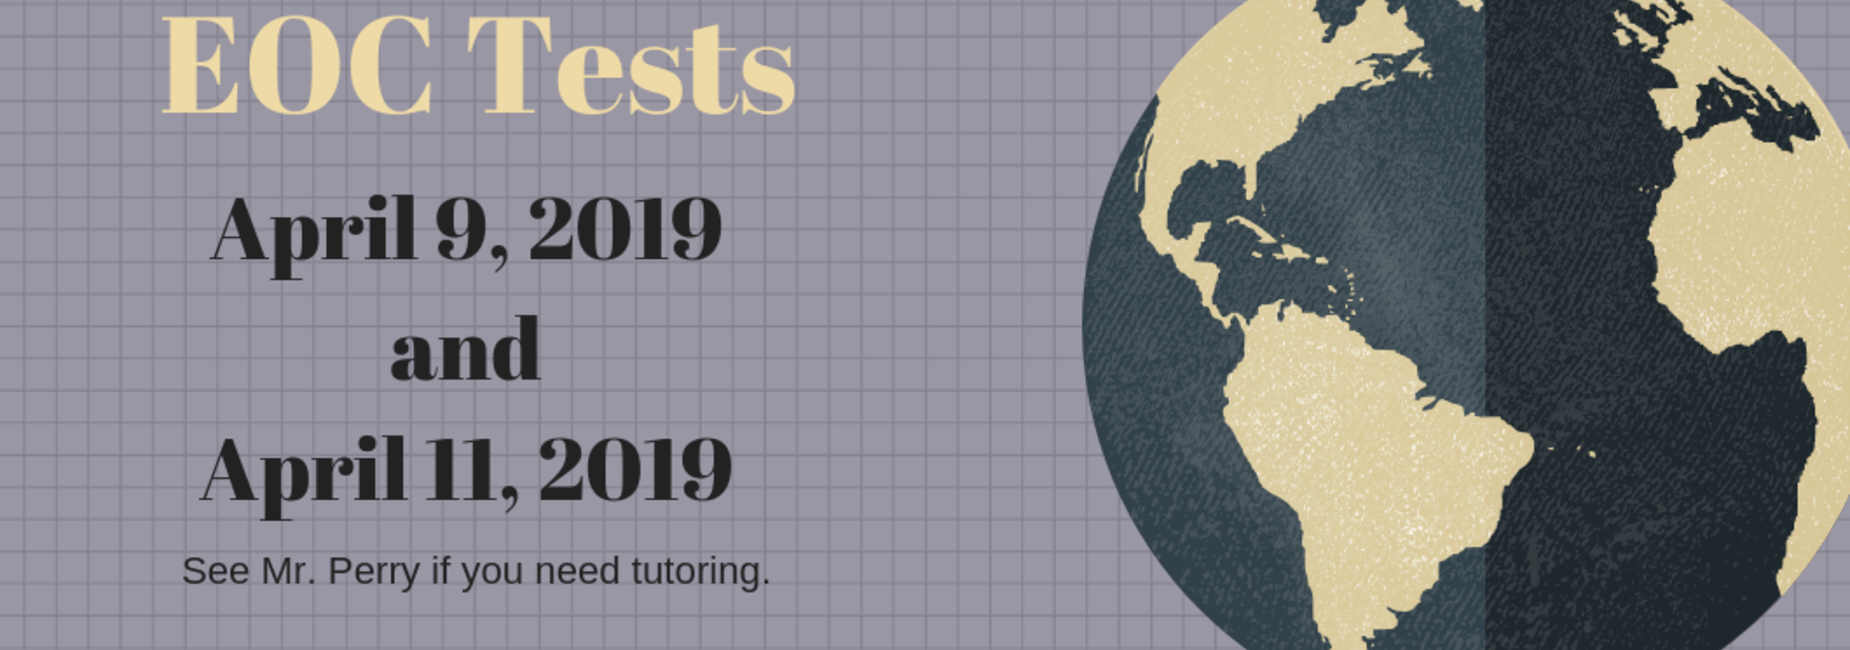 EOC Testing April 9 and 11, 2019